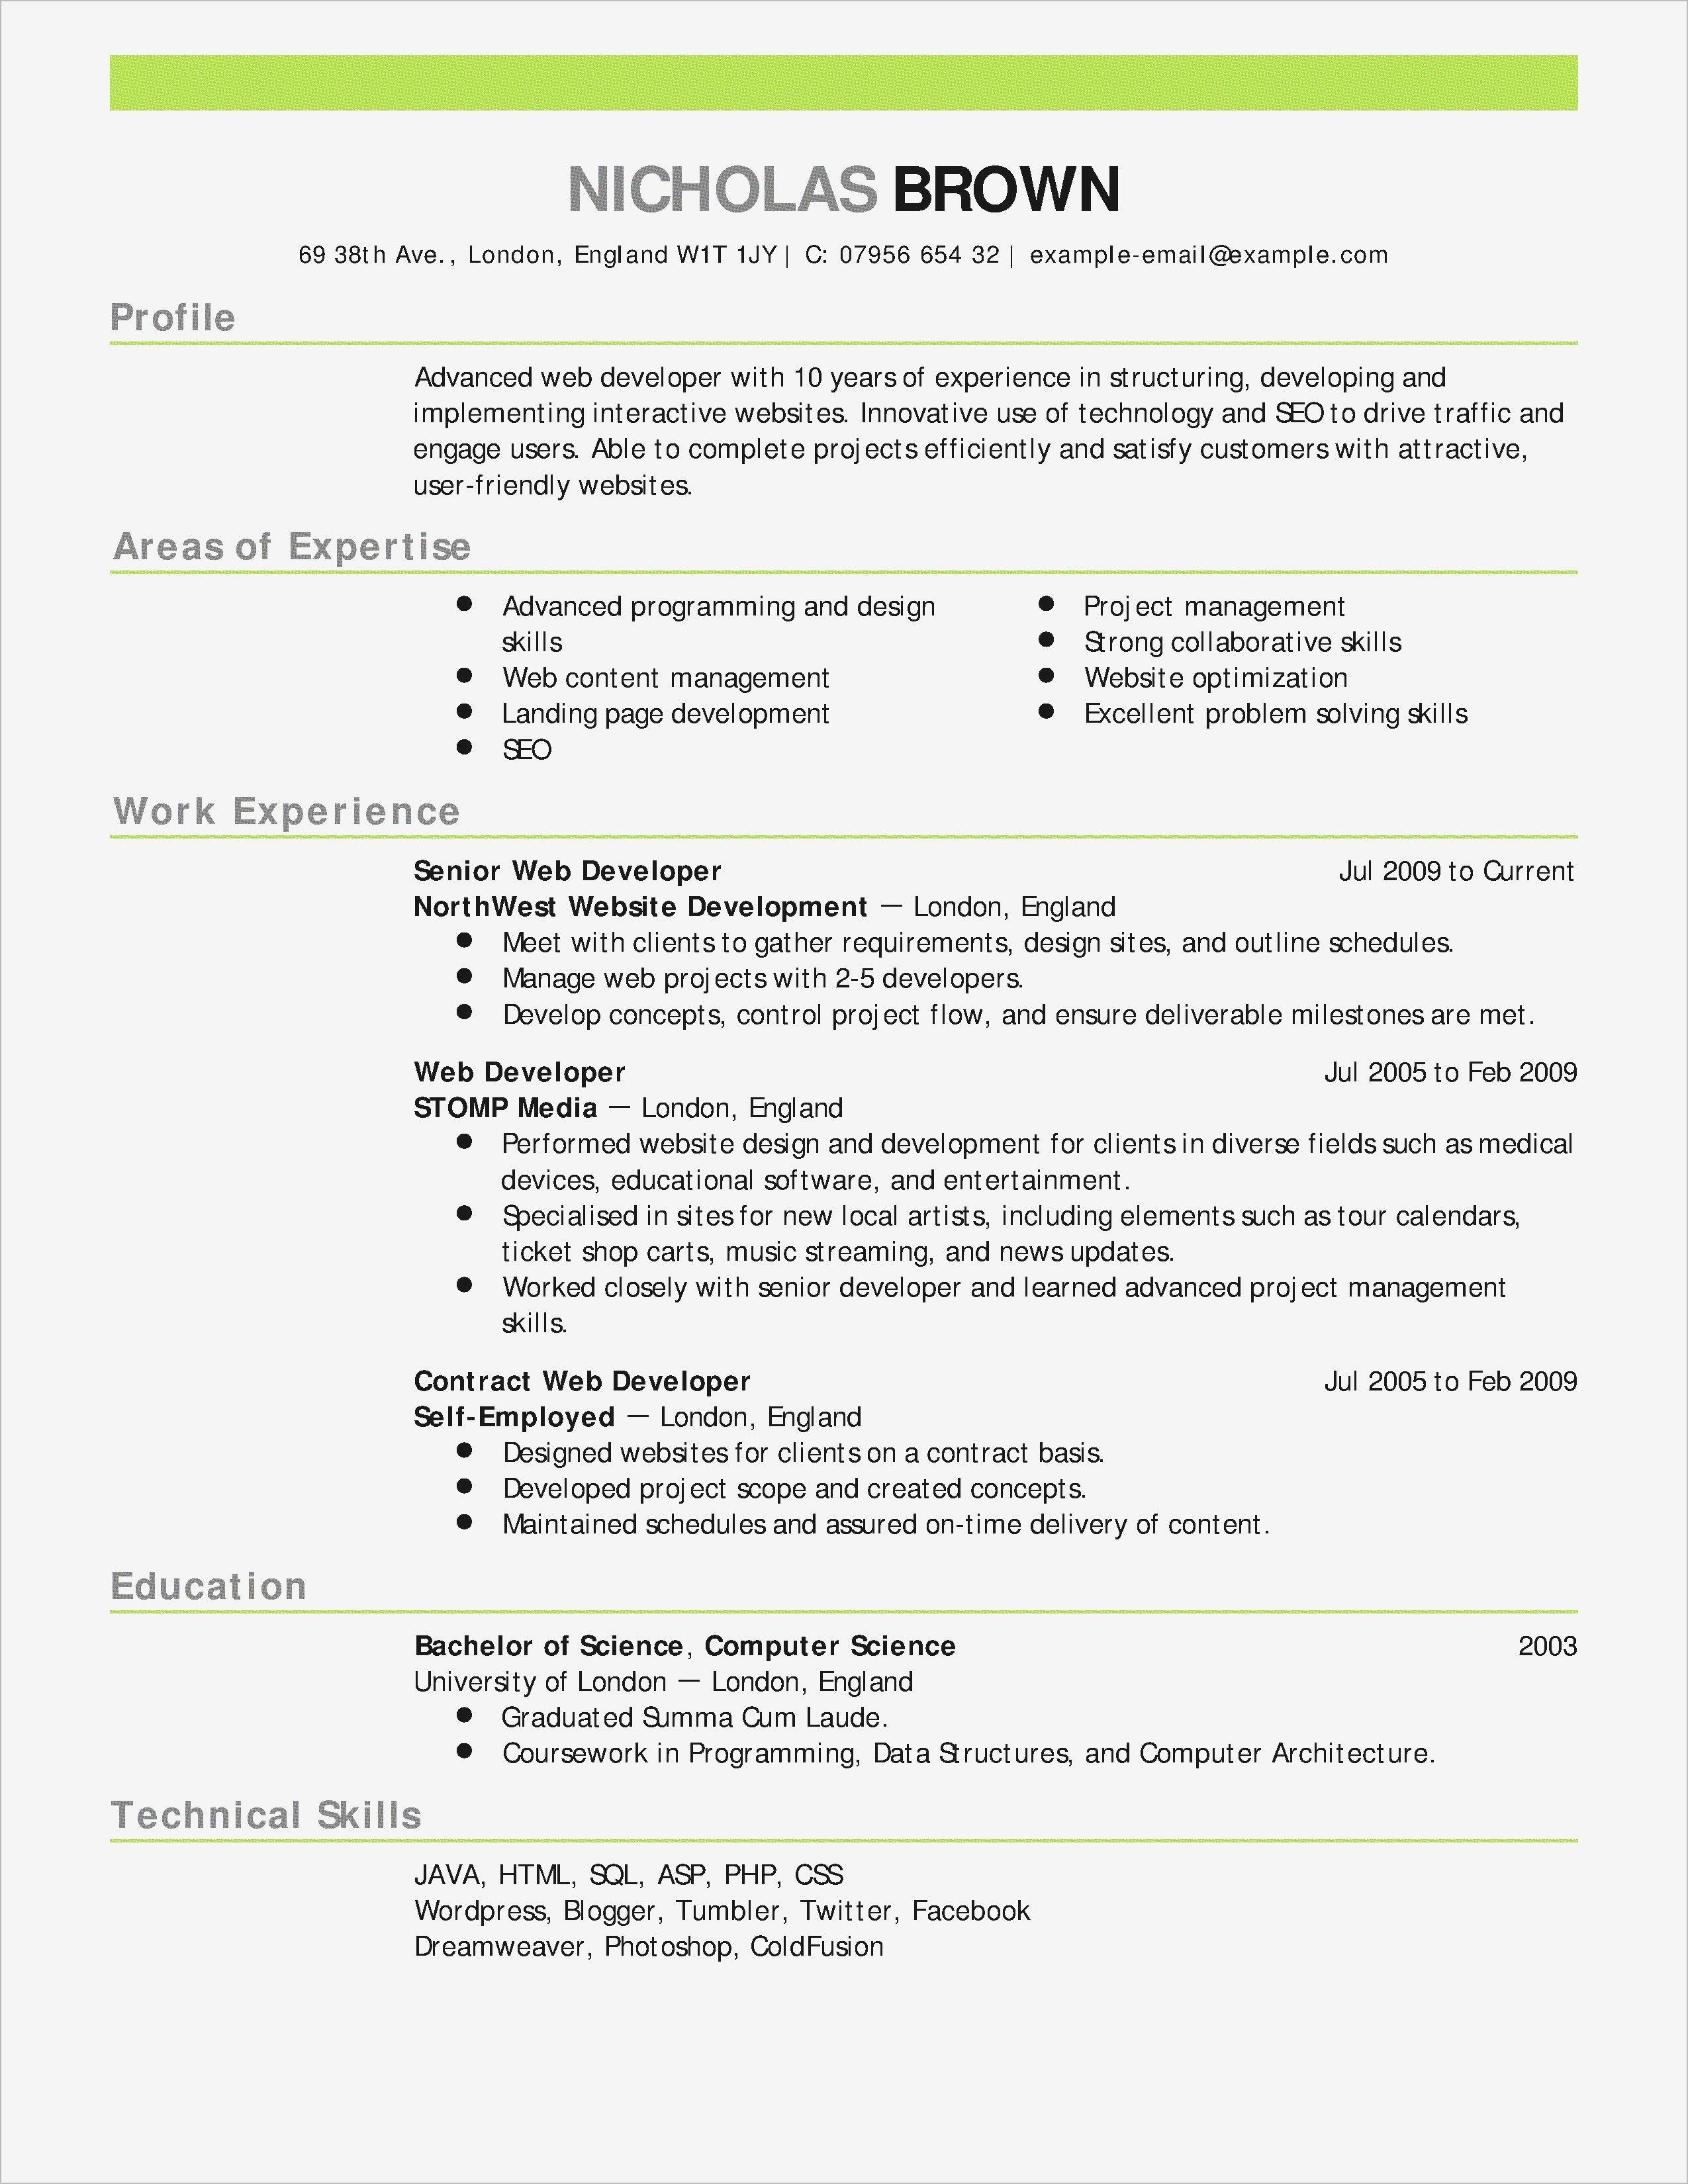 resume format guidelines    format  guidelines  resume  resumeformat